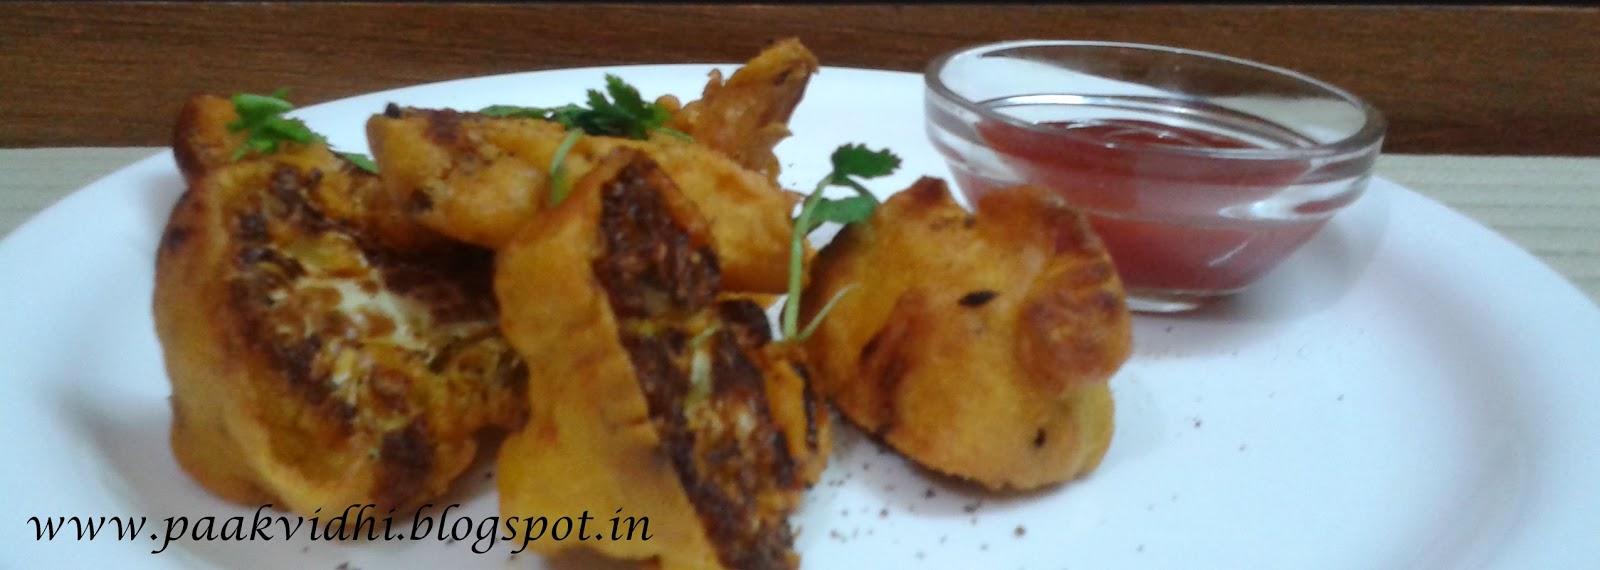 http://paakvidhi.blogspot.in/2014/01/gobi-ke-pakore.html